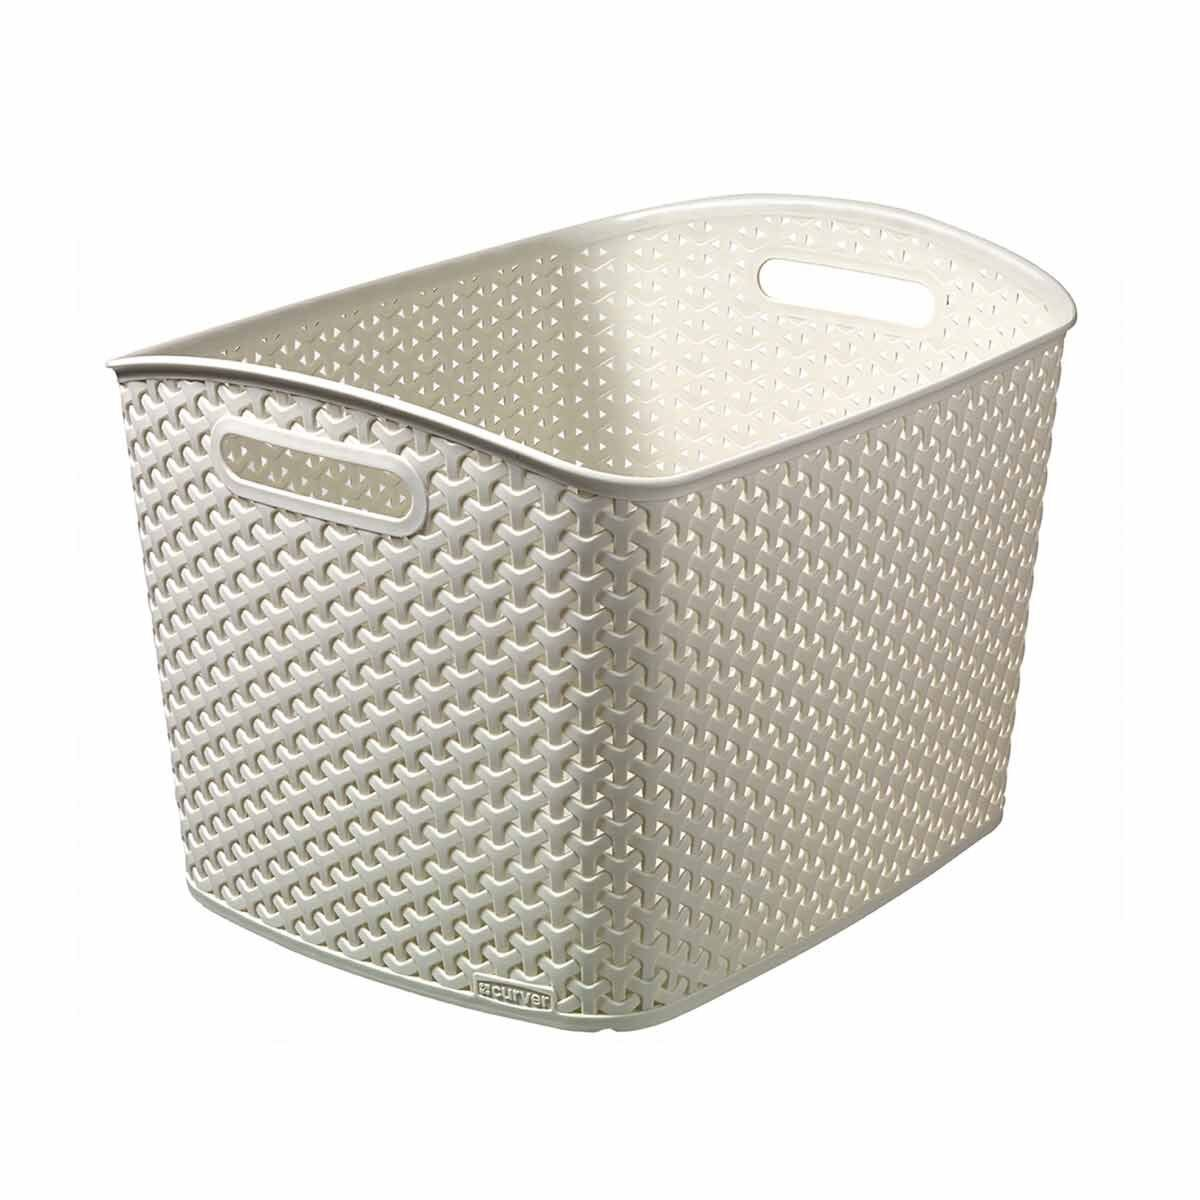 Curver My Style XL Basket 28 Litre Cream